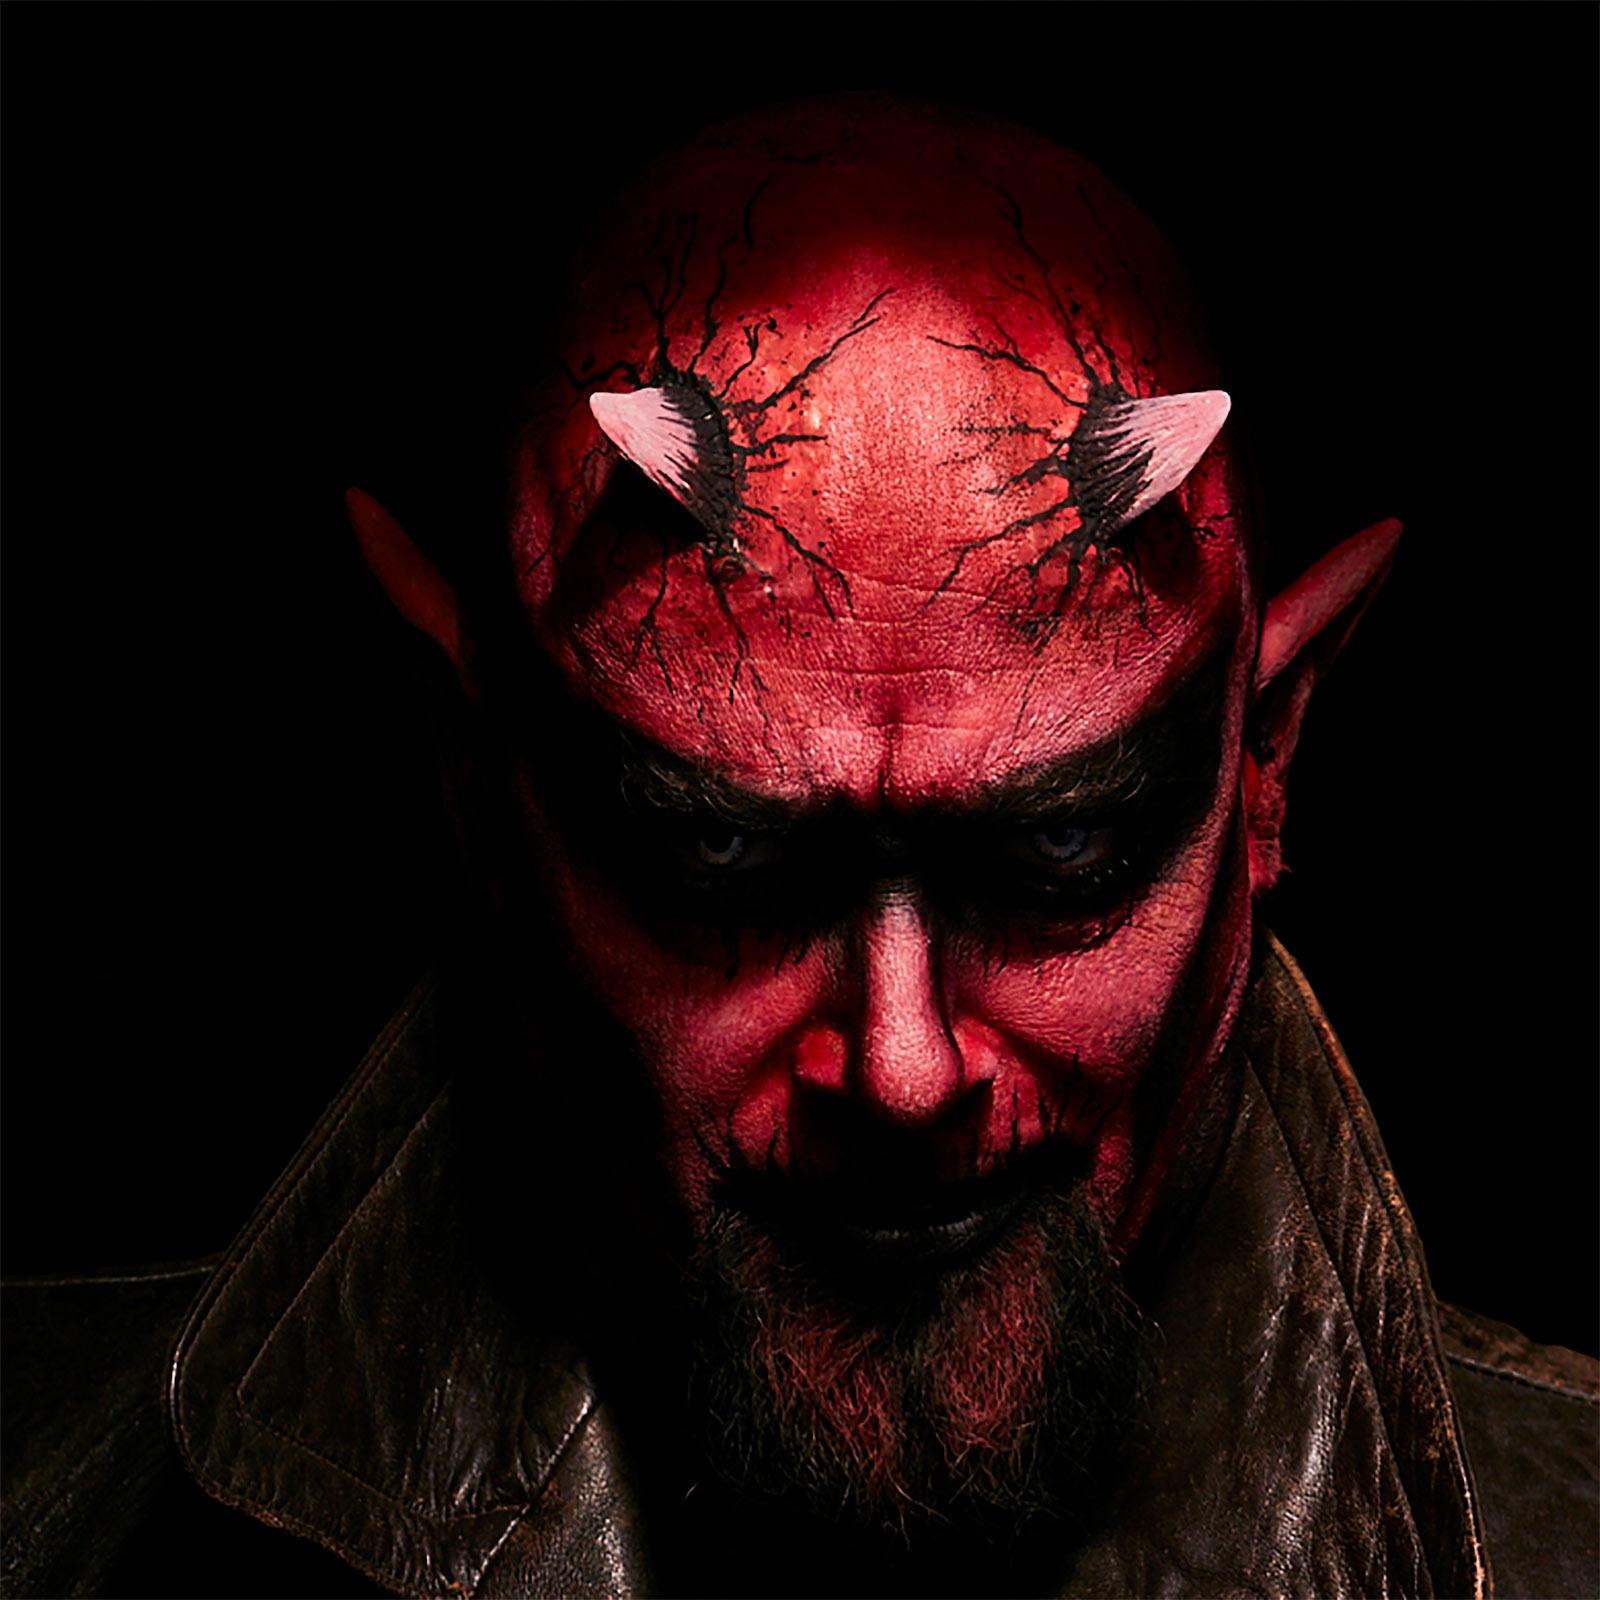 Dämon - Hörner aus Latex